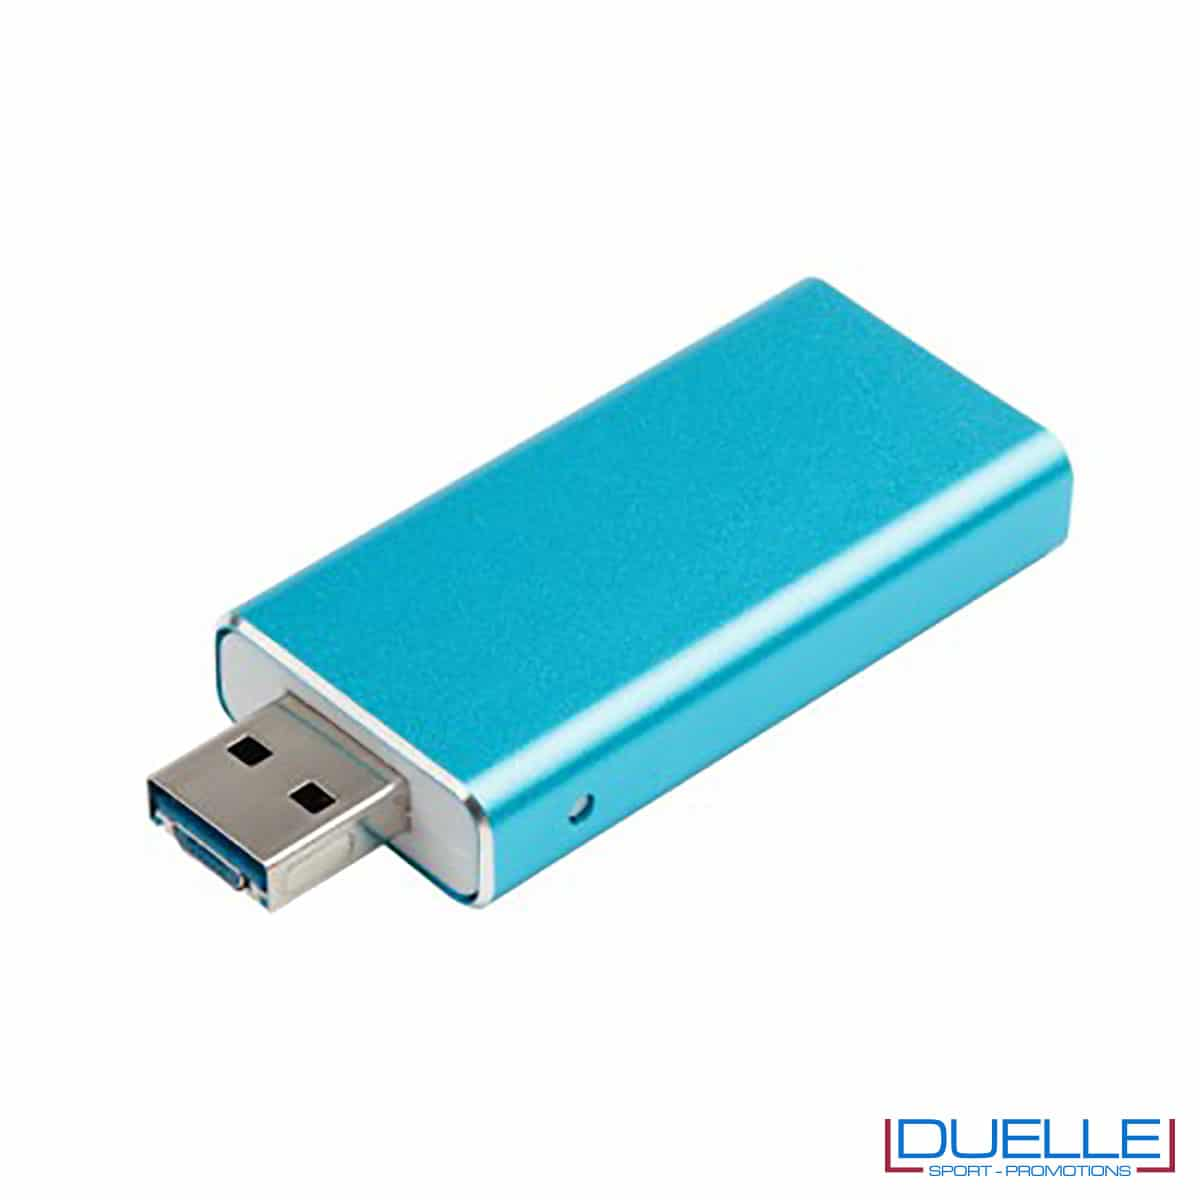 chiavetta blu 3 in 1 con logo